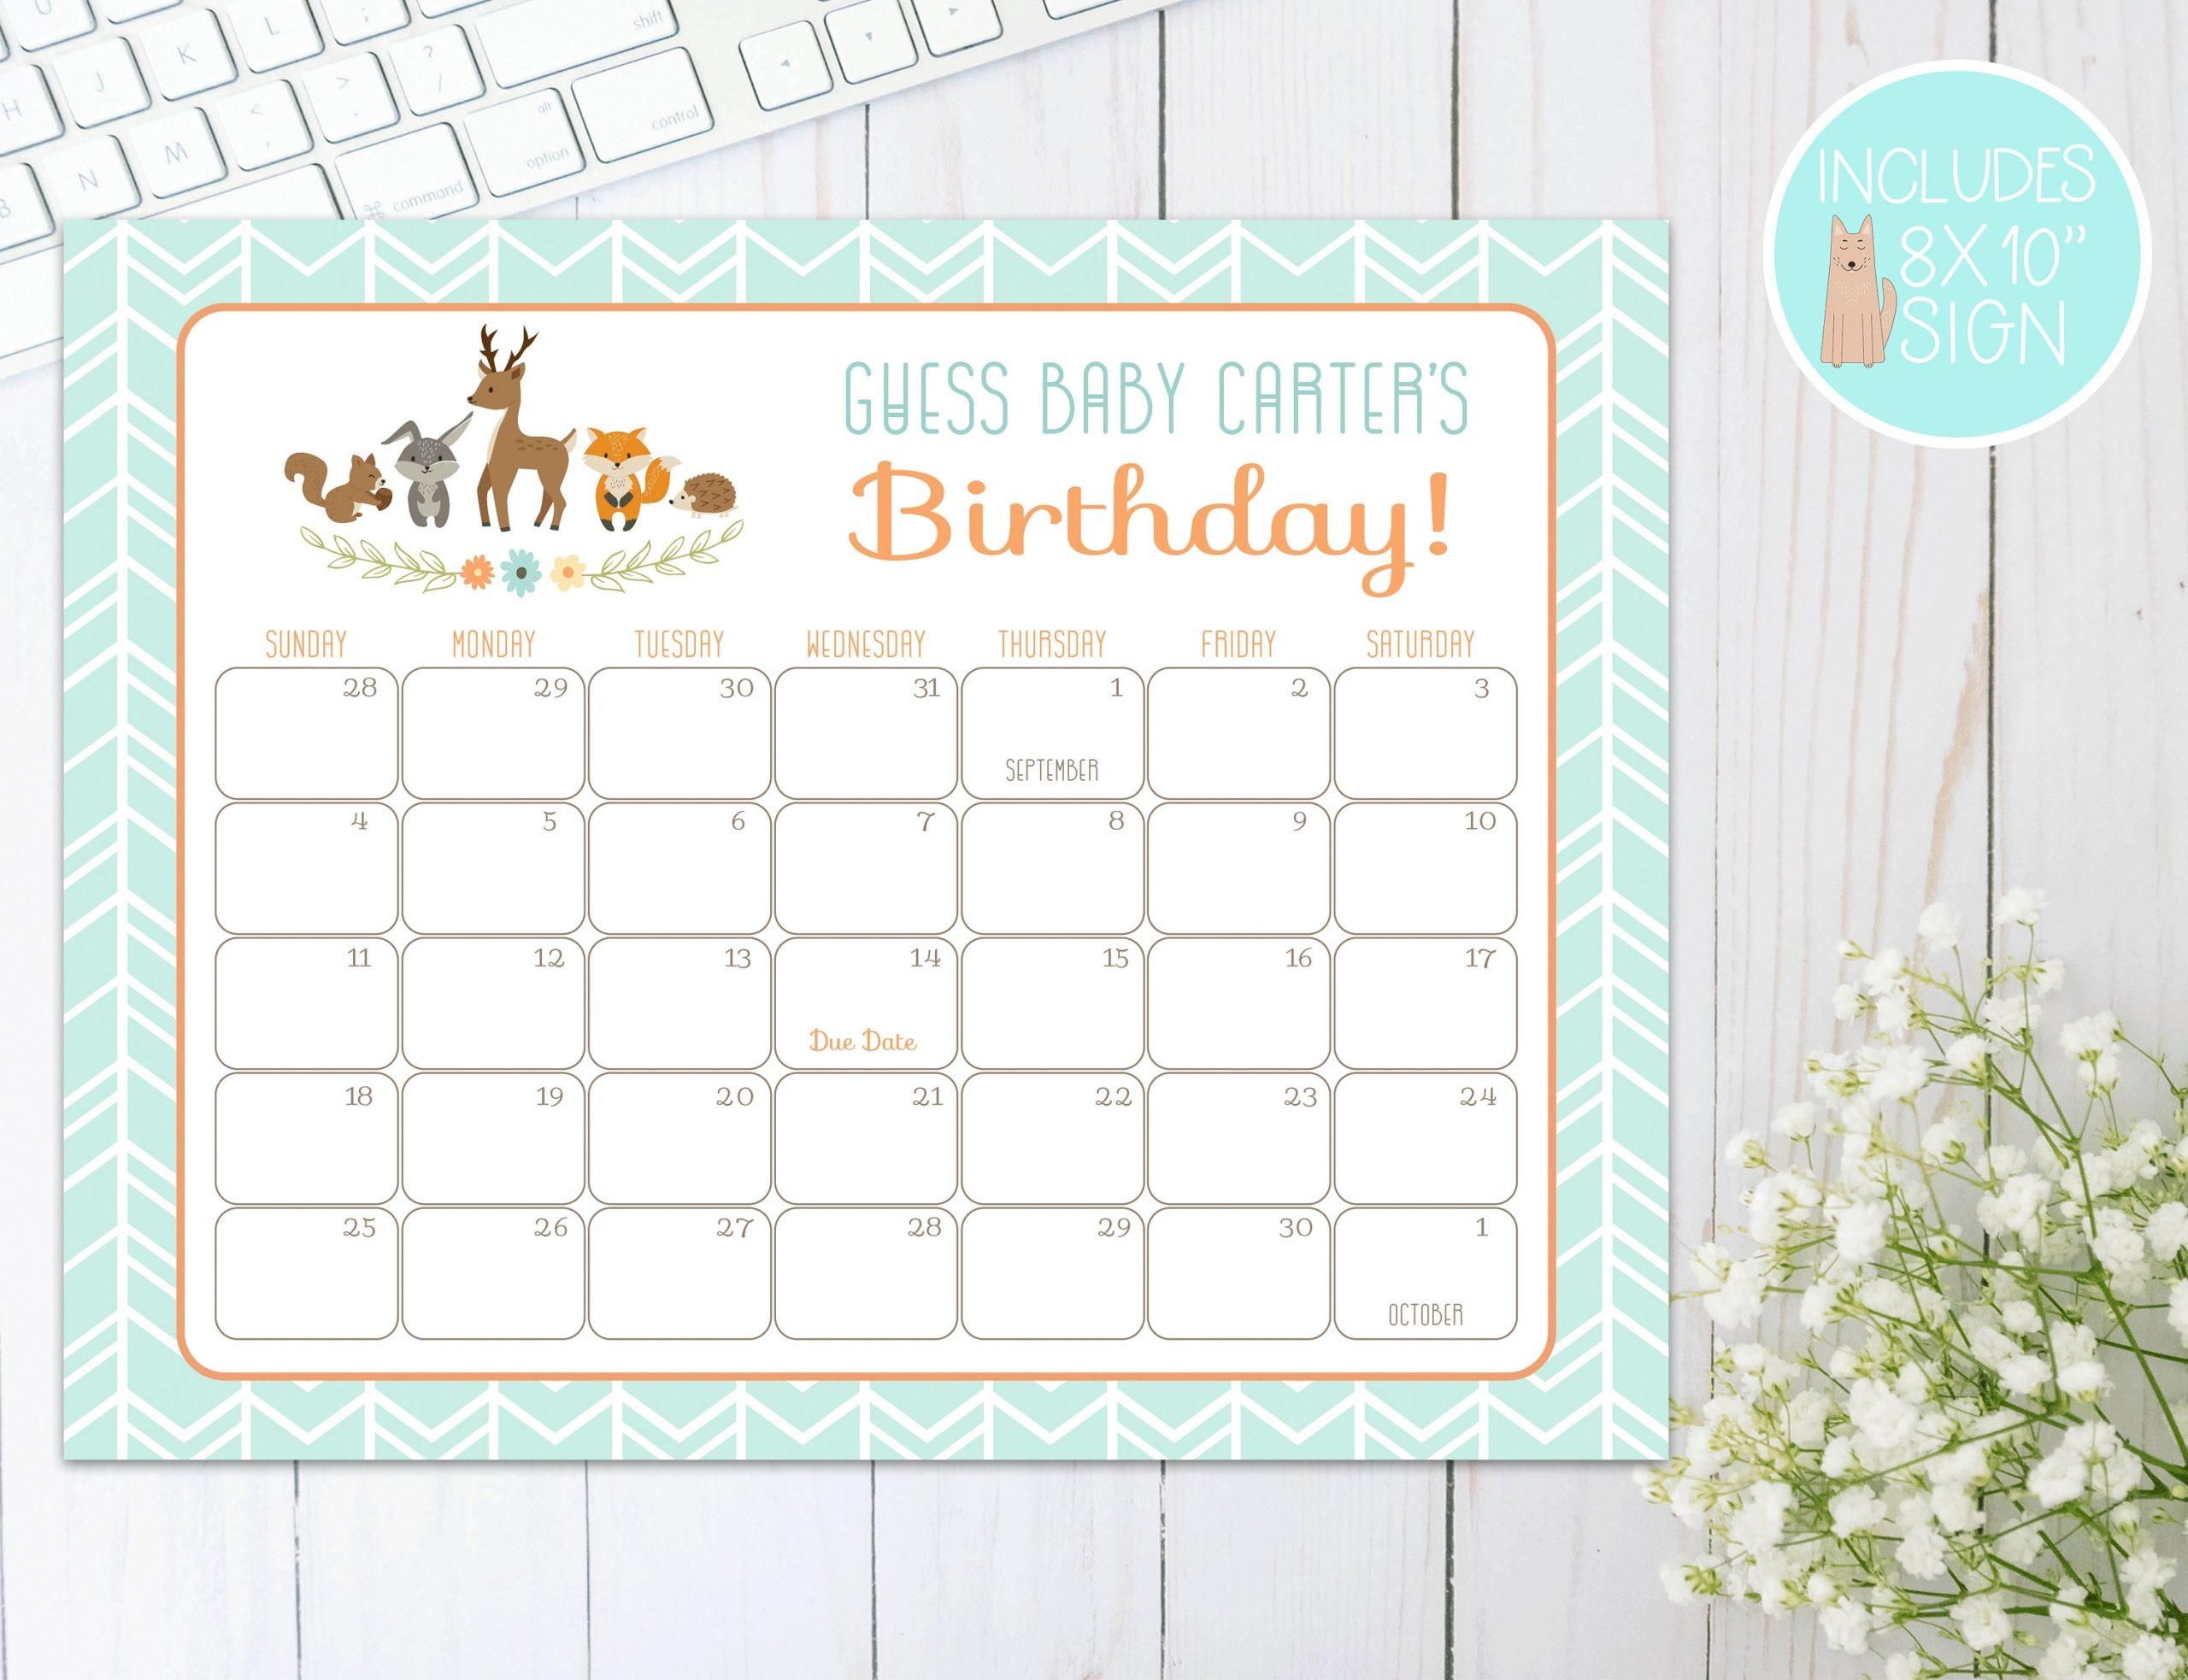 Woodland Baby Shower Due Date Calendar | Prediction Calendar | Guess Baby'S  Birthday | Baby Shower Games, Decorations | Deer, Fox, Rabbit